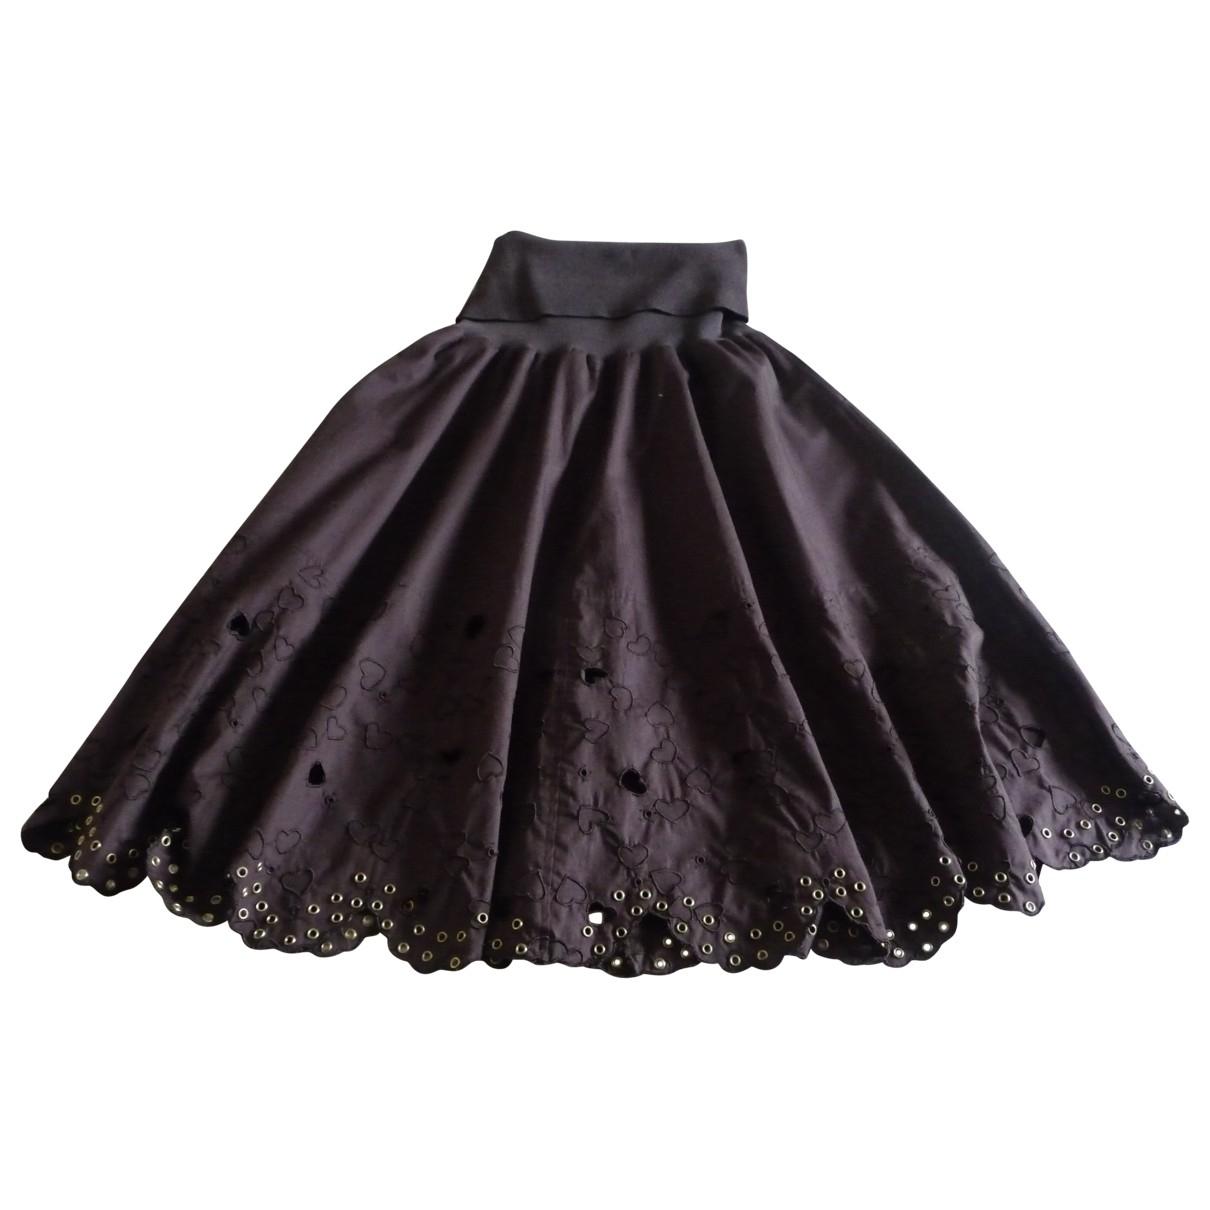 Sonia By Sonia Rykiel \N Brown Cotton skirt for Women 38 FR